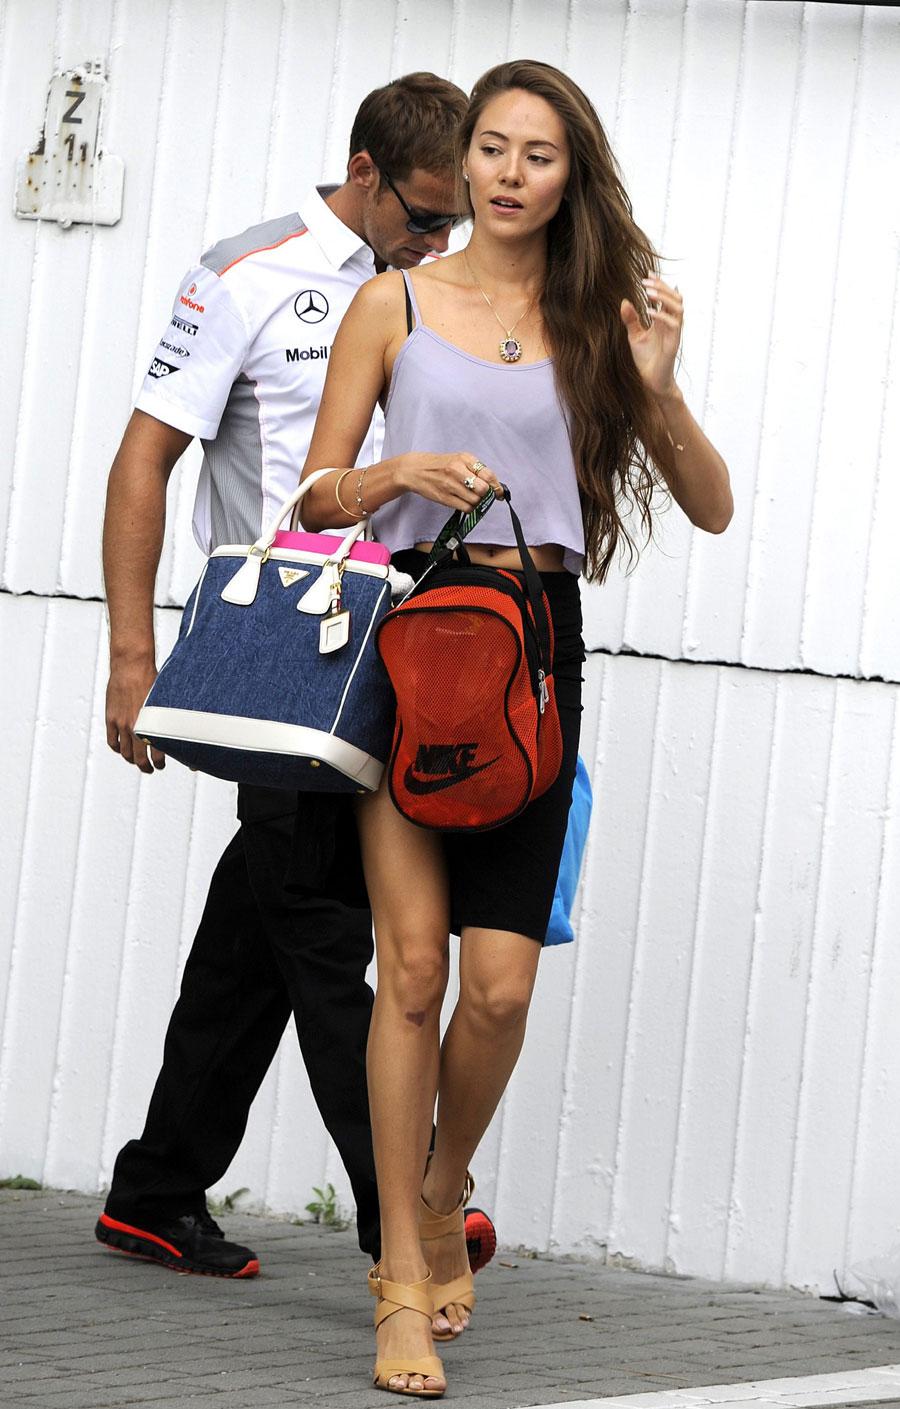 Jessica Michibata walks out of the McLaren garage